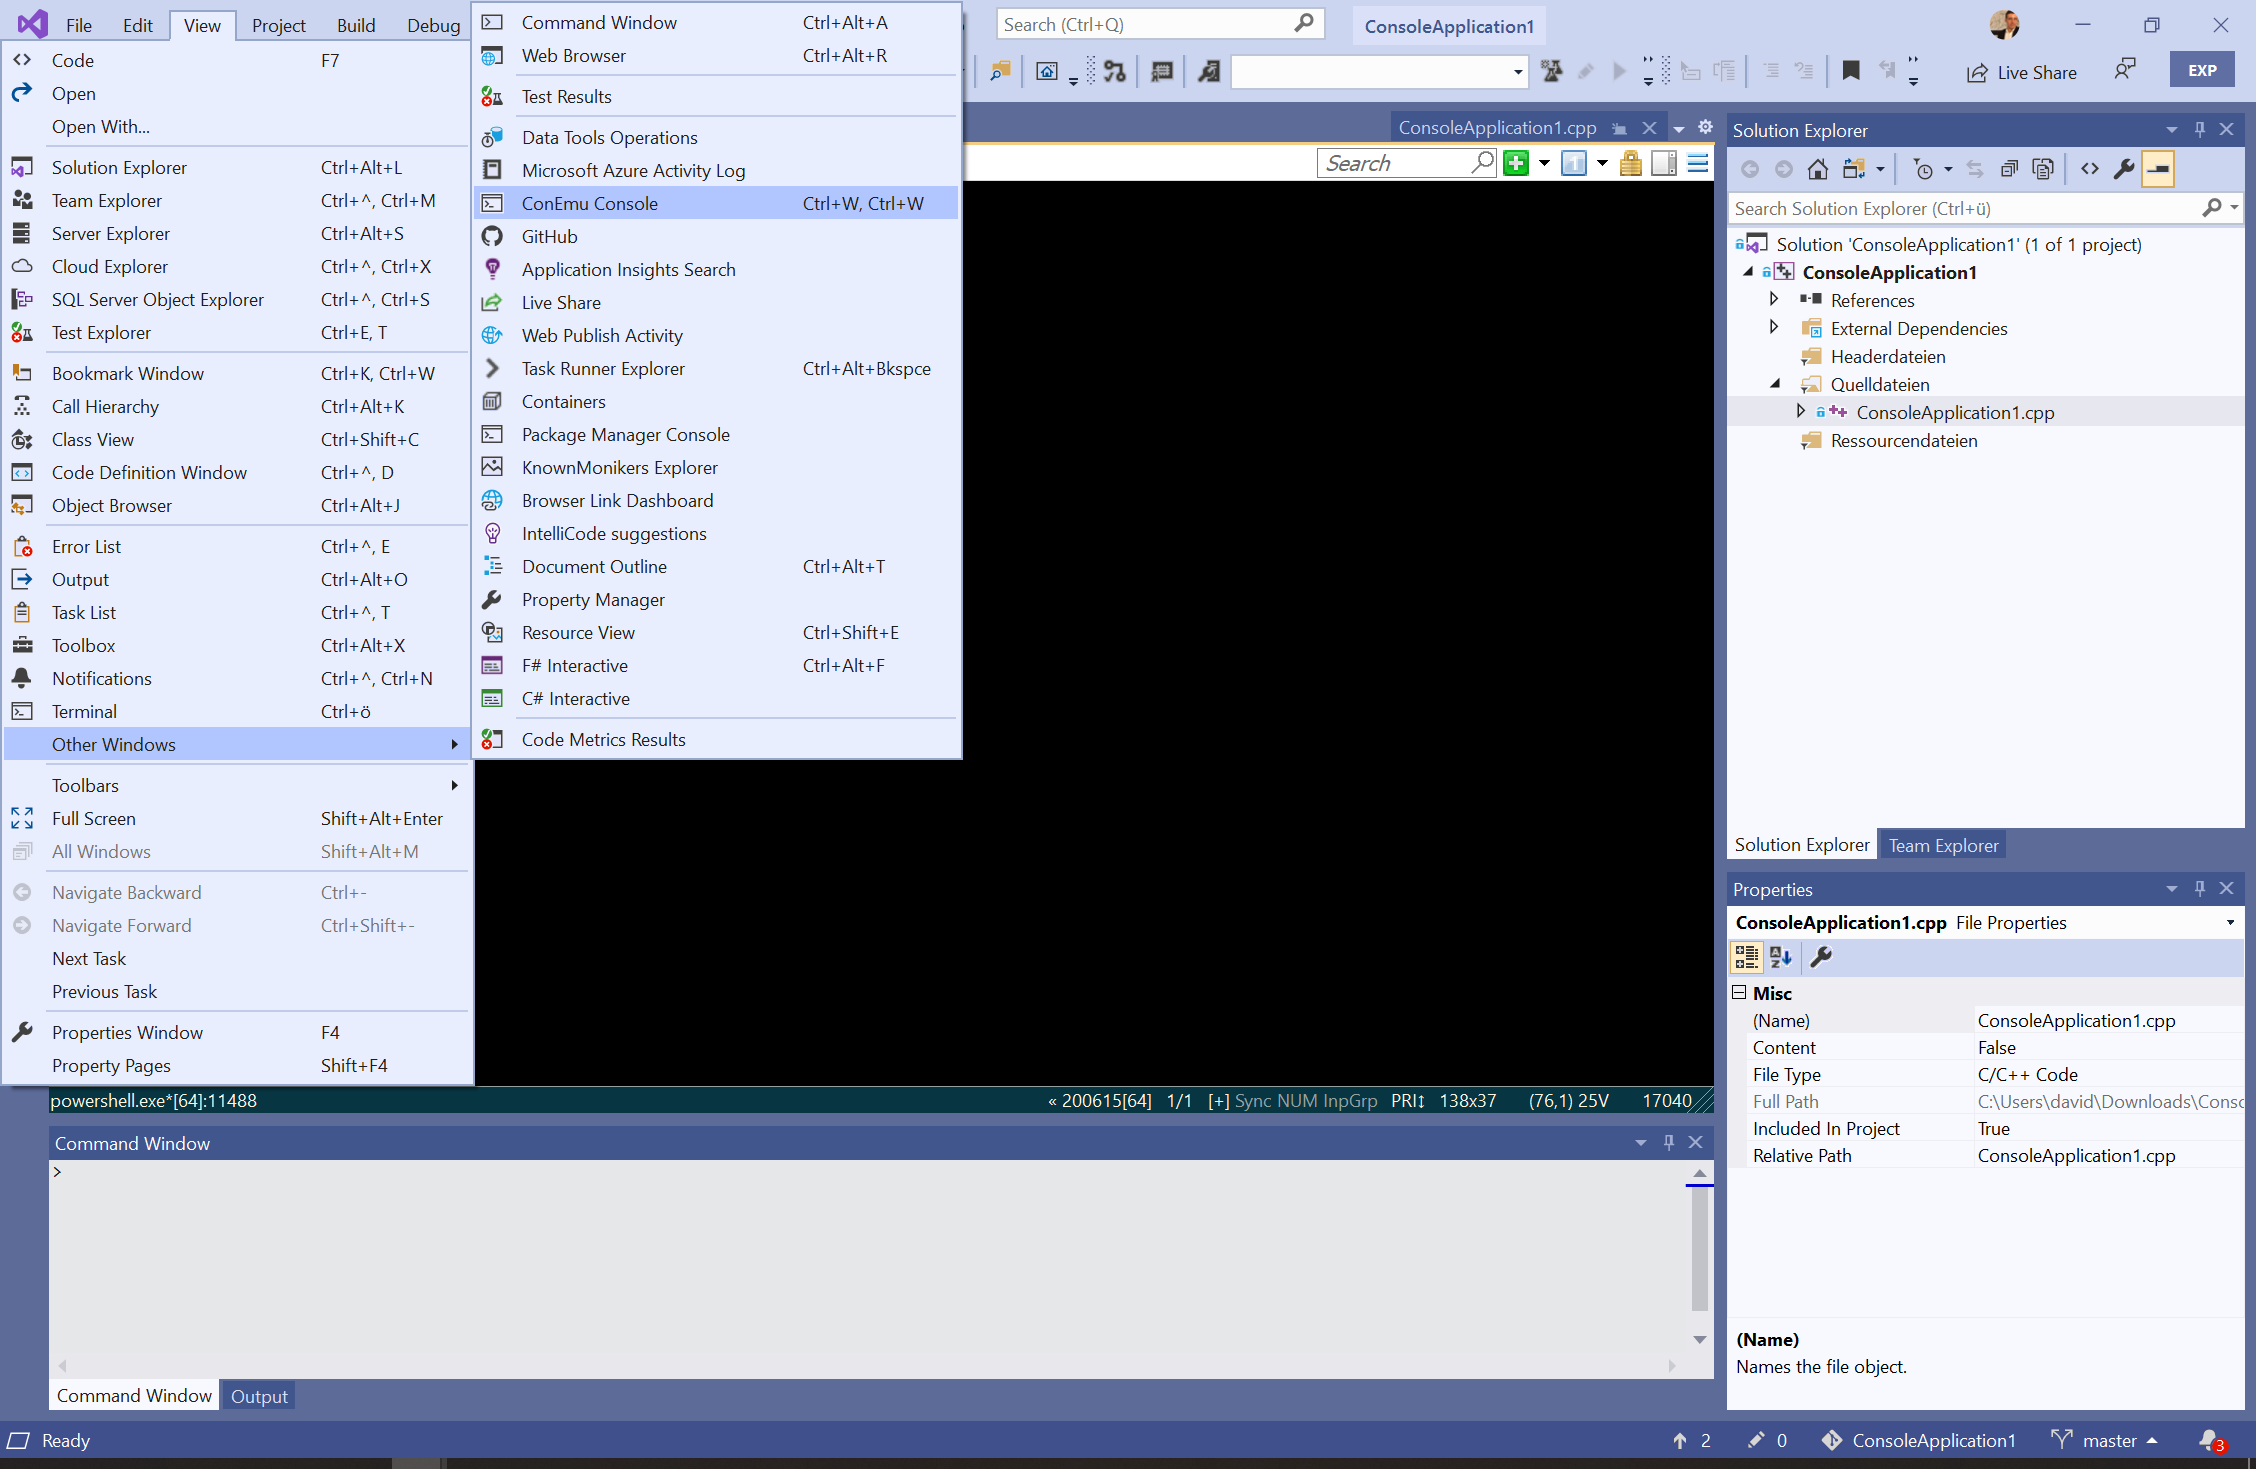 Open ConEmu integrated in Visual Studio